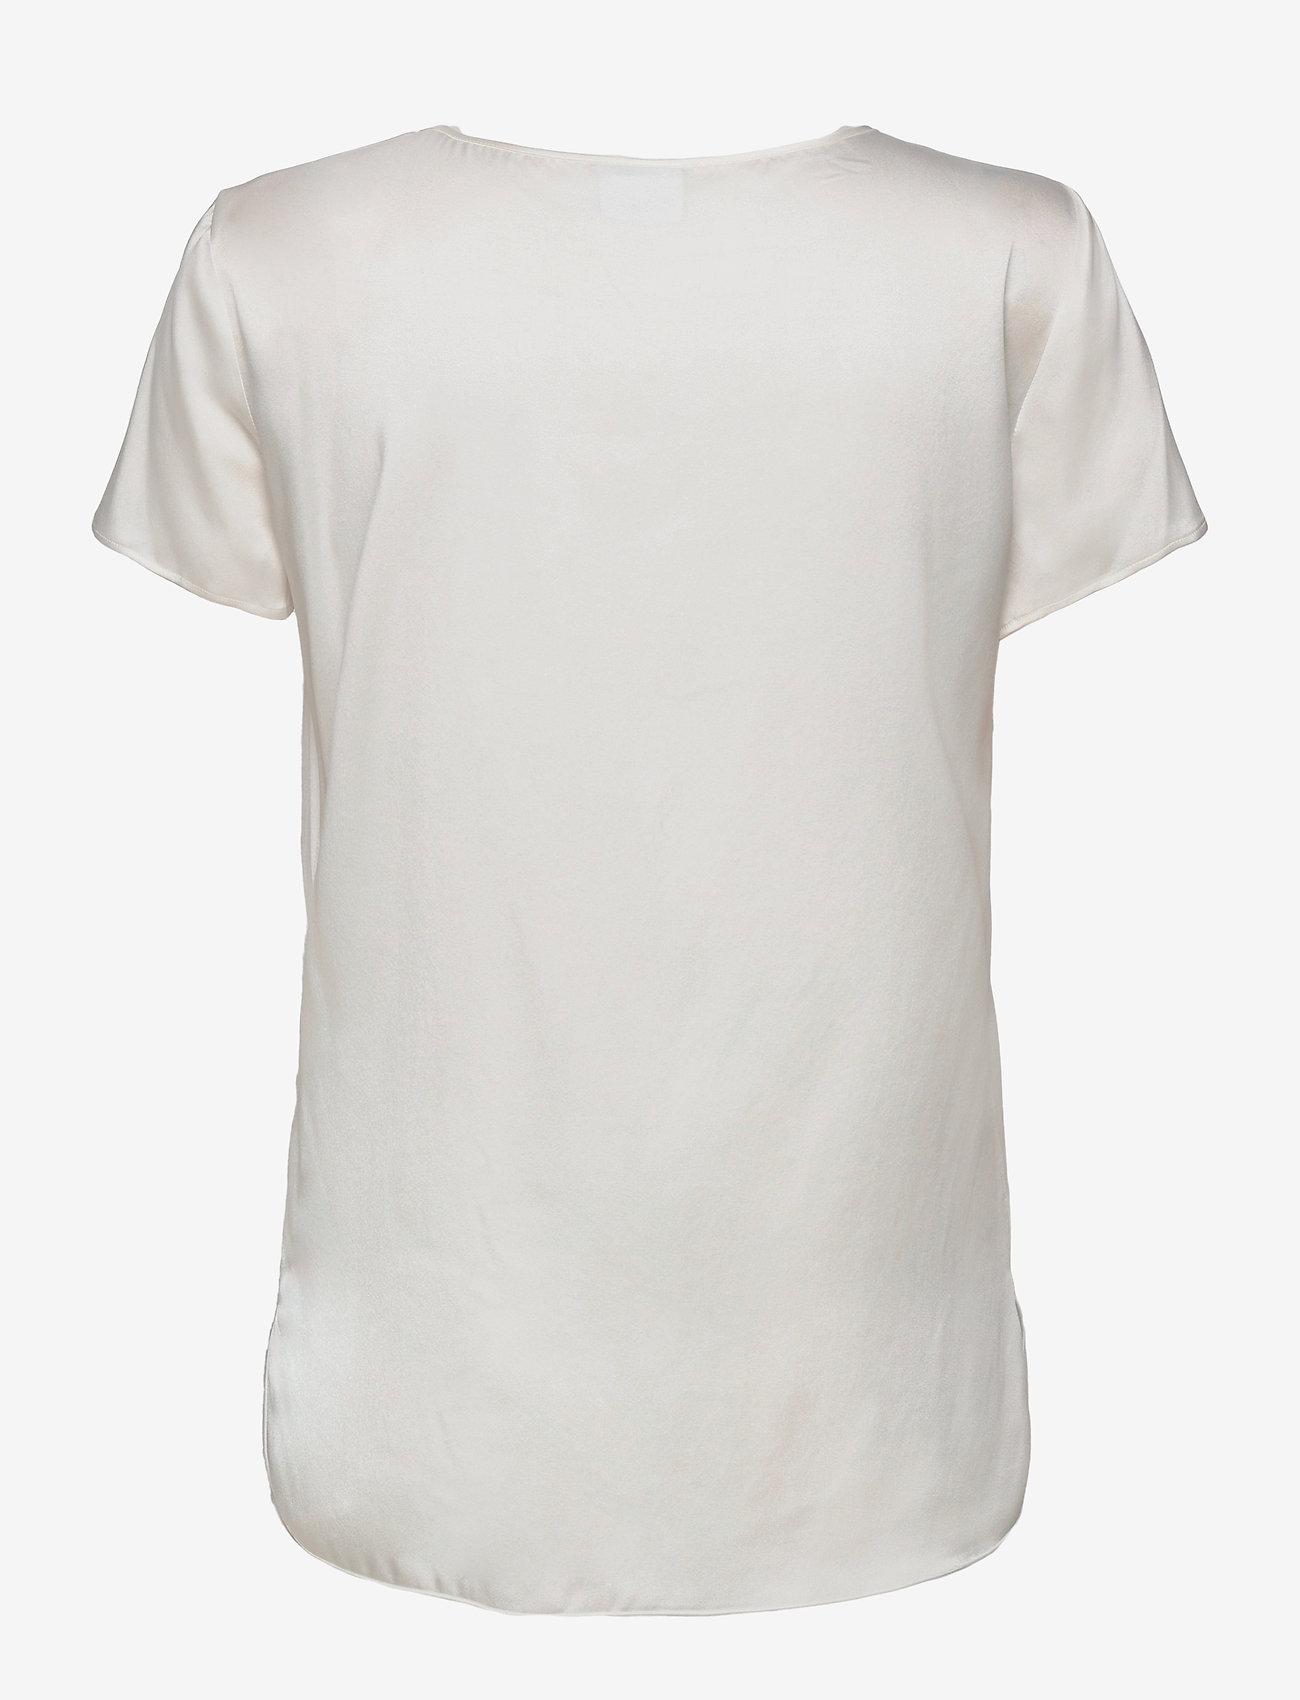 Max Mara Leisure - CORTONA - short-sleeved blouses - white - 1